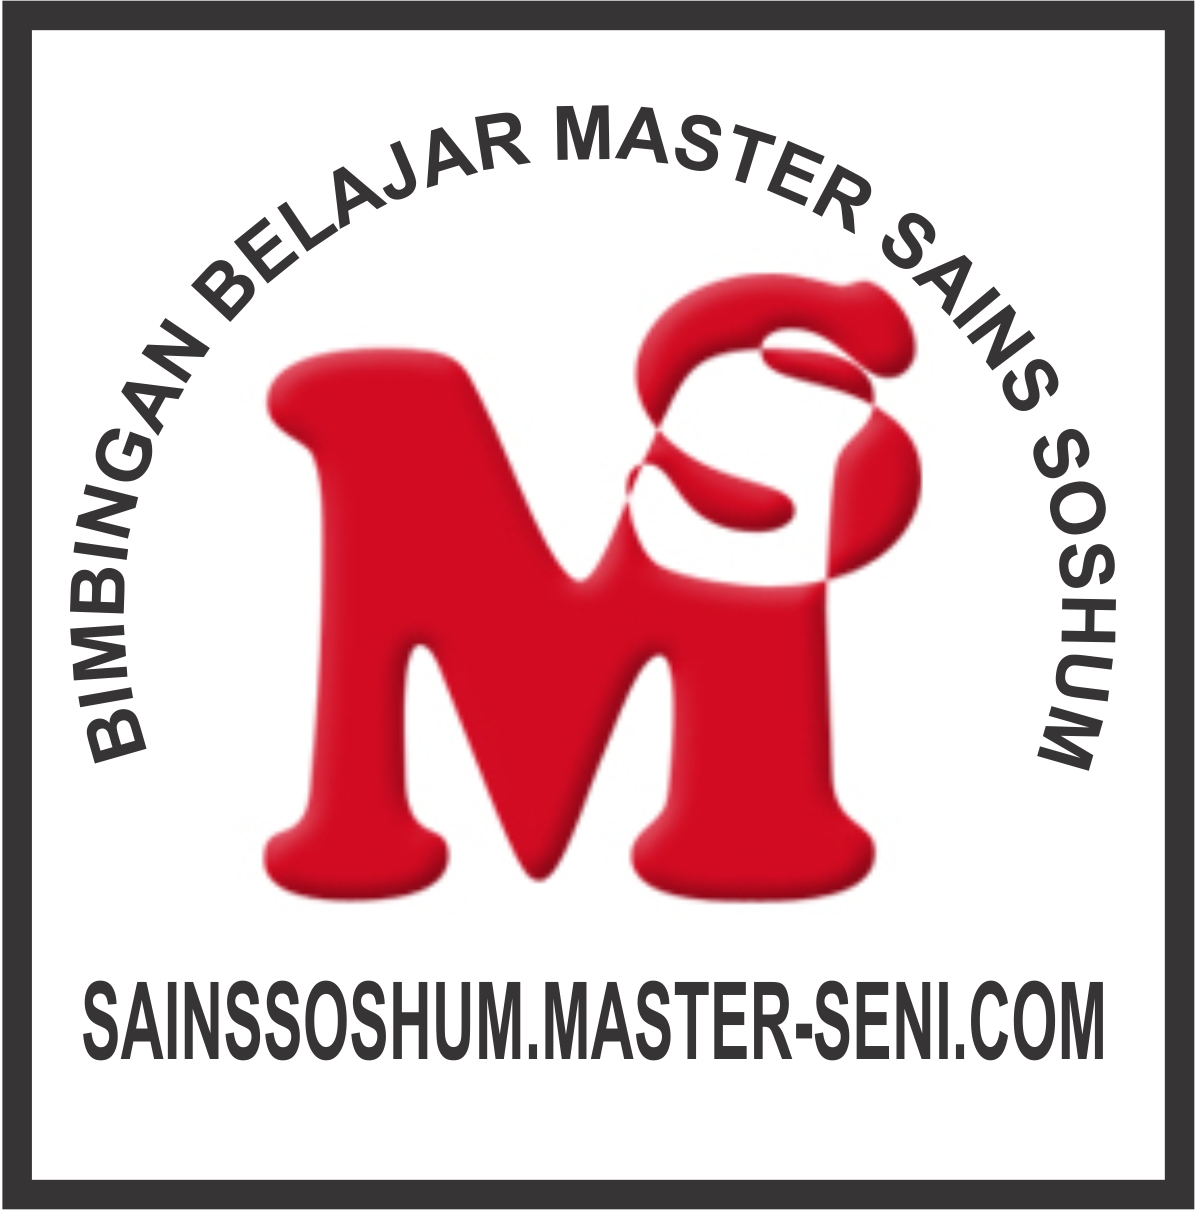 Master Sains Soshum